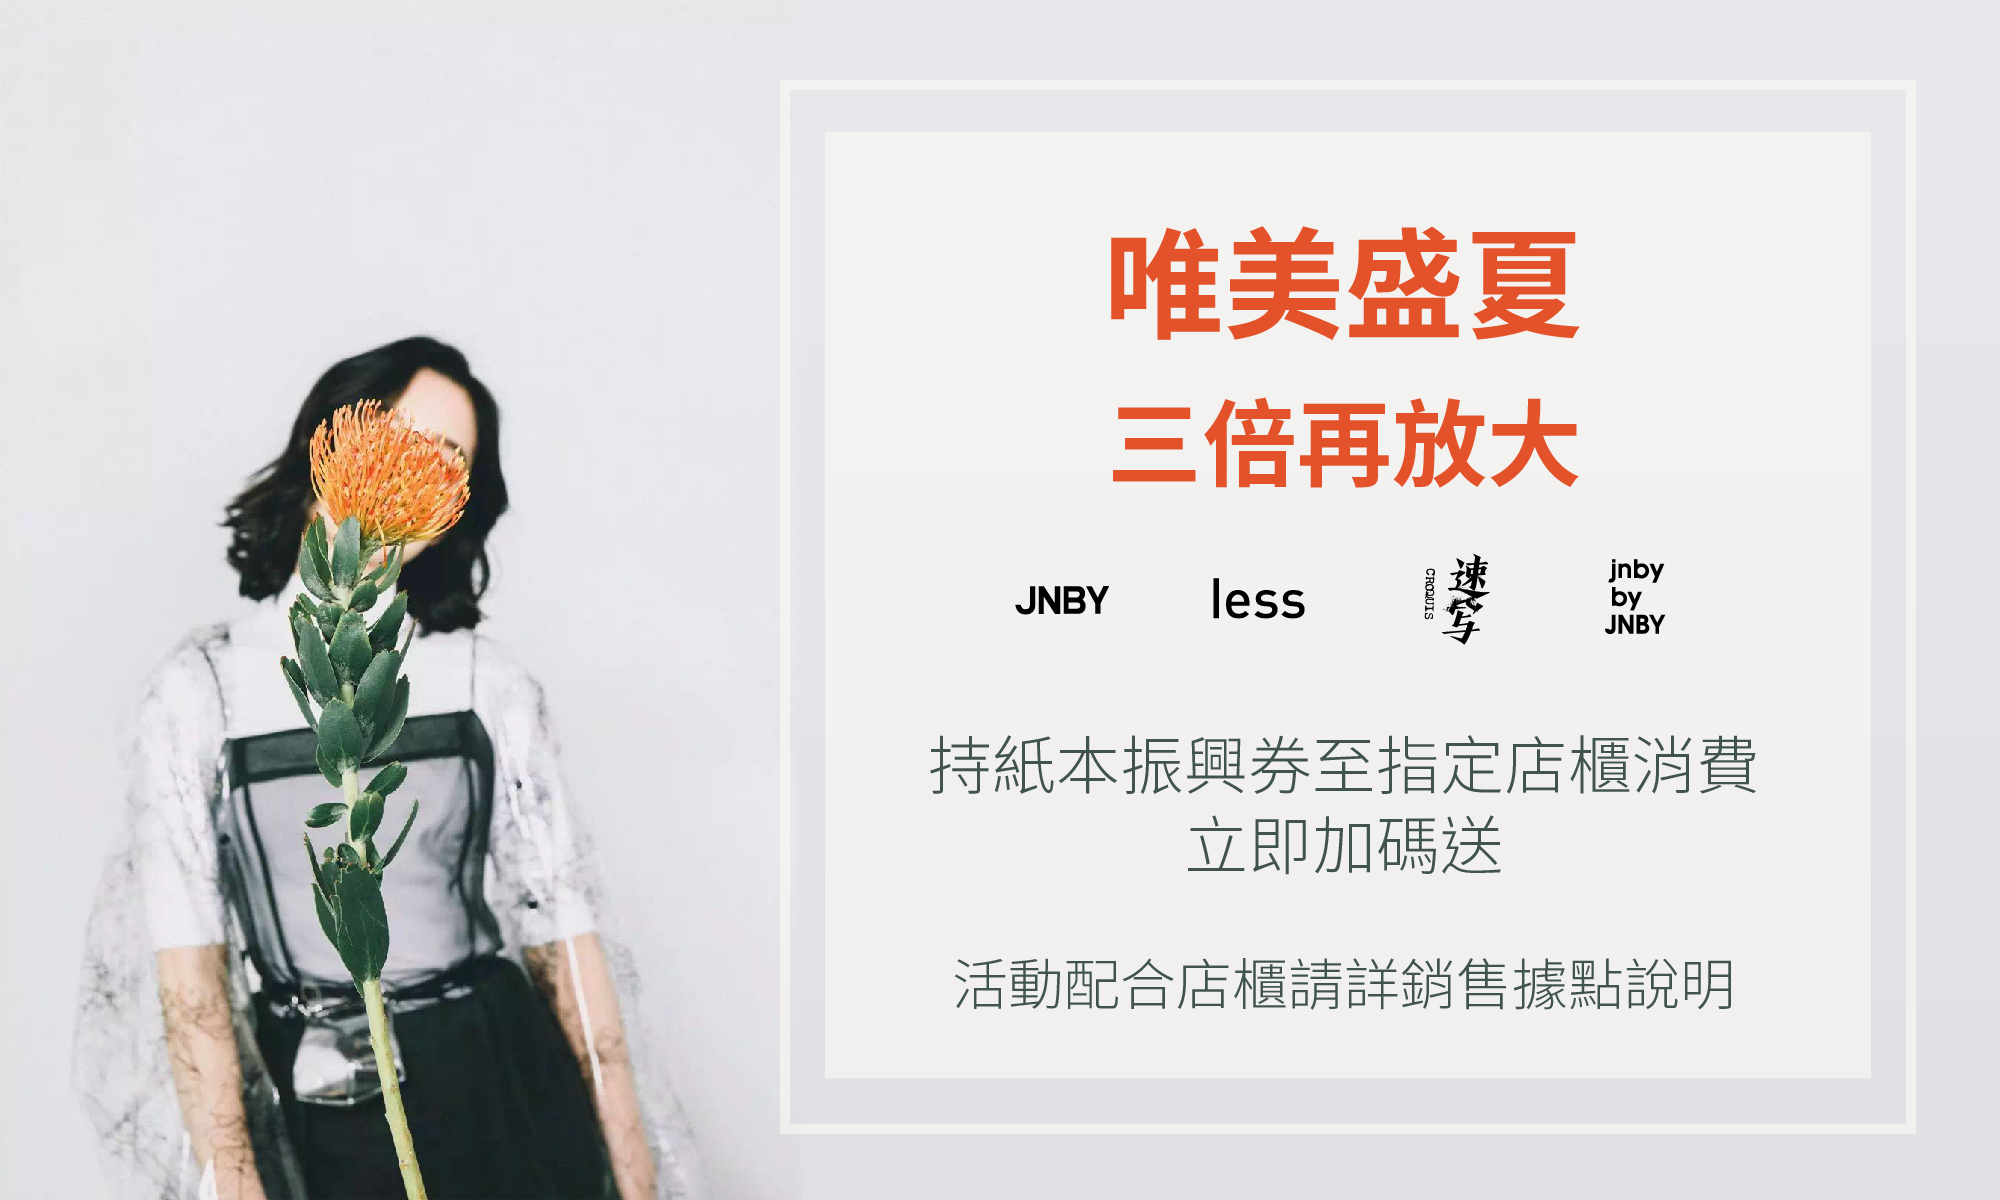 JNBY,三倍振興券